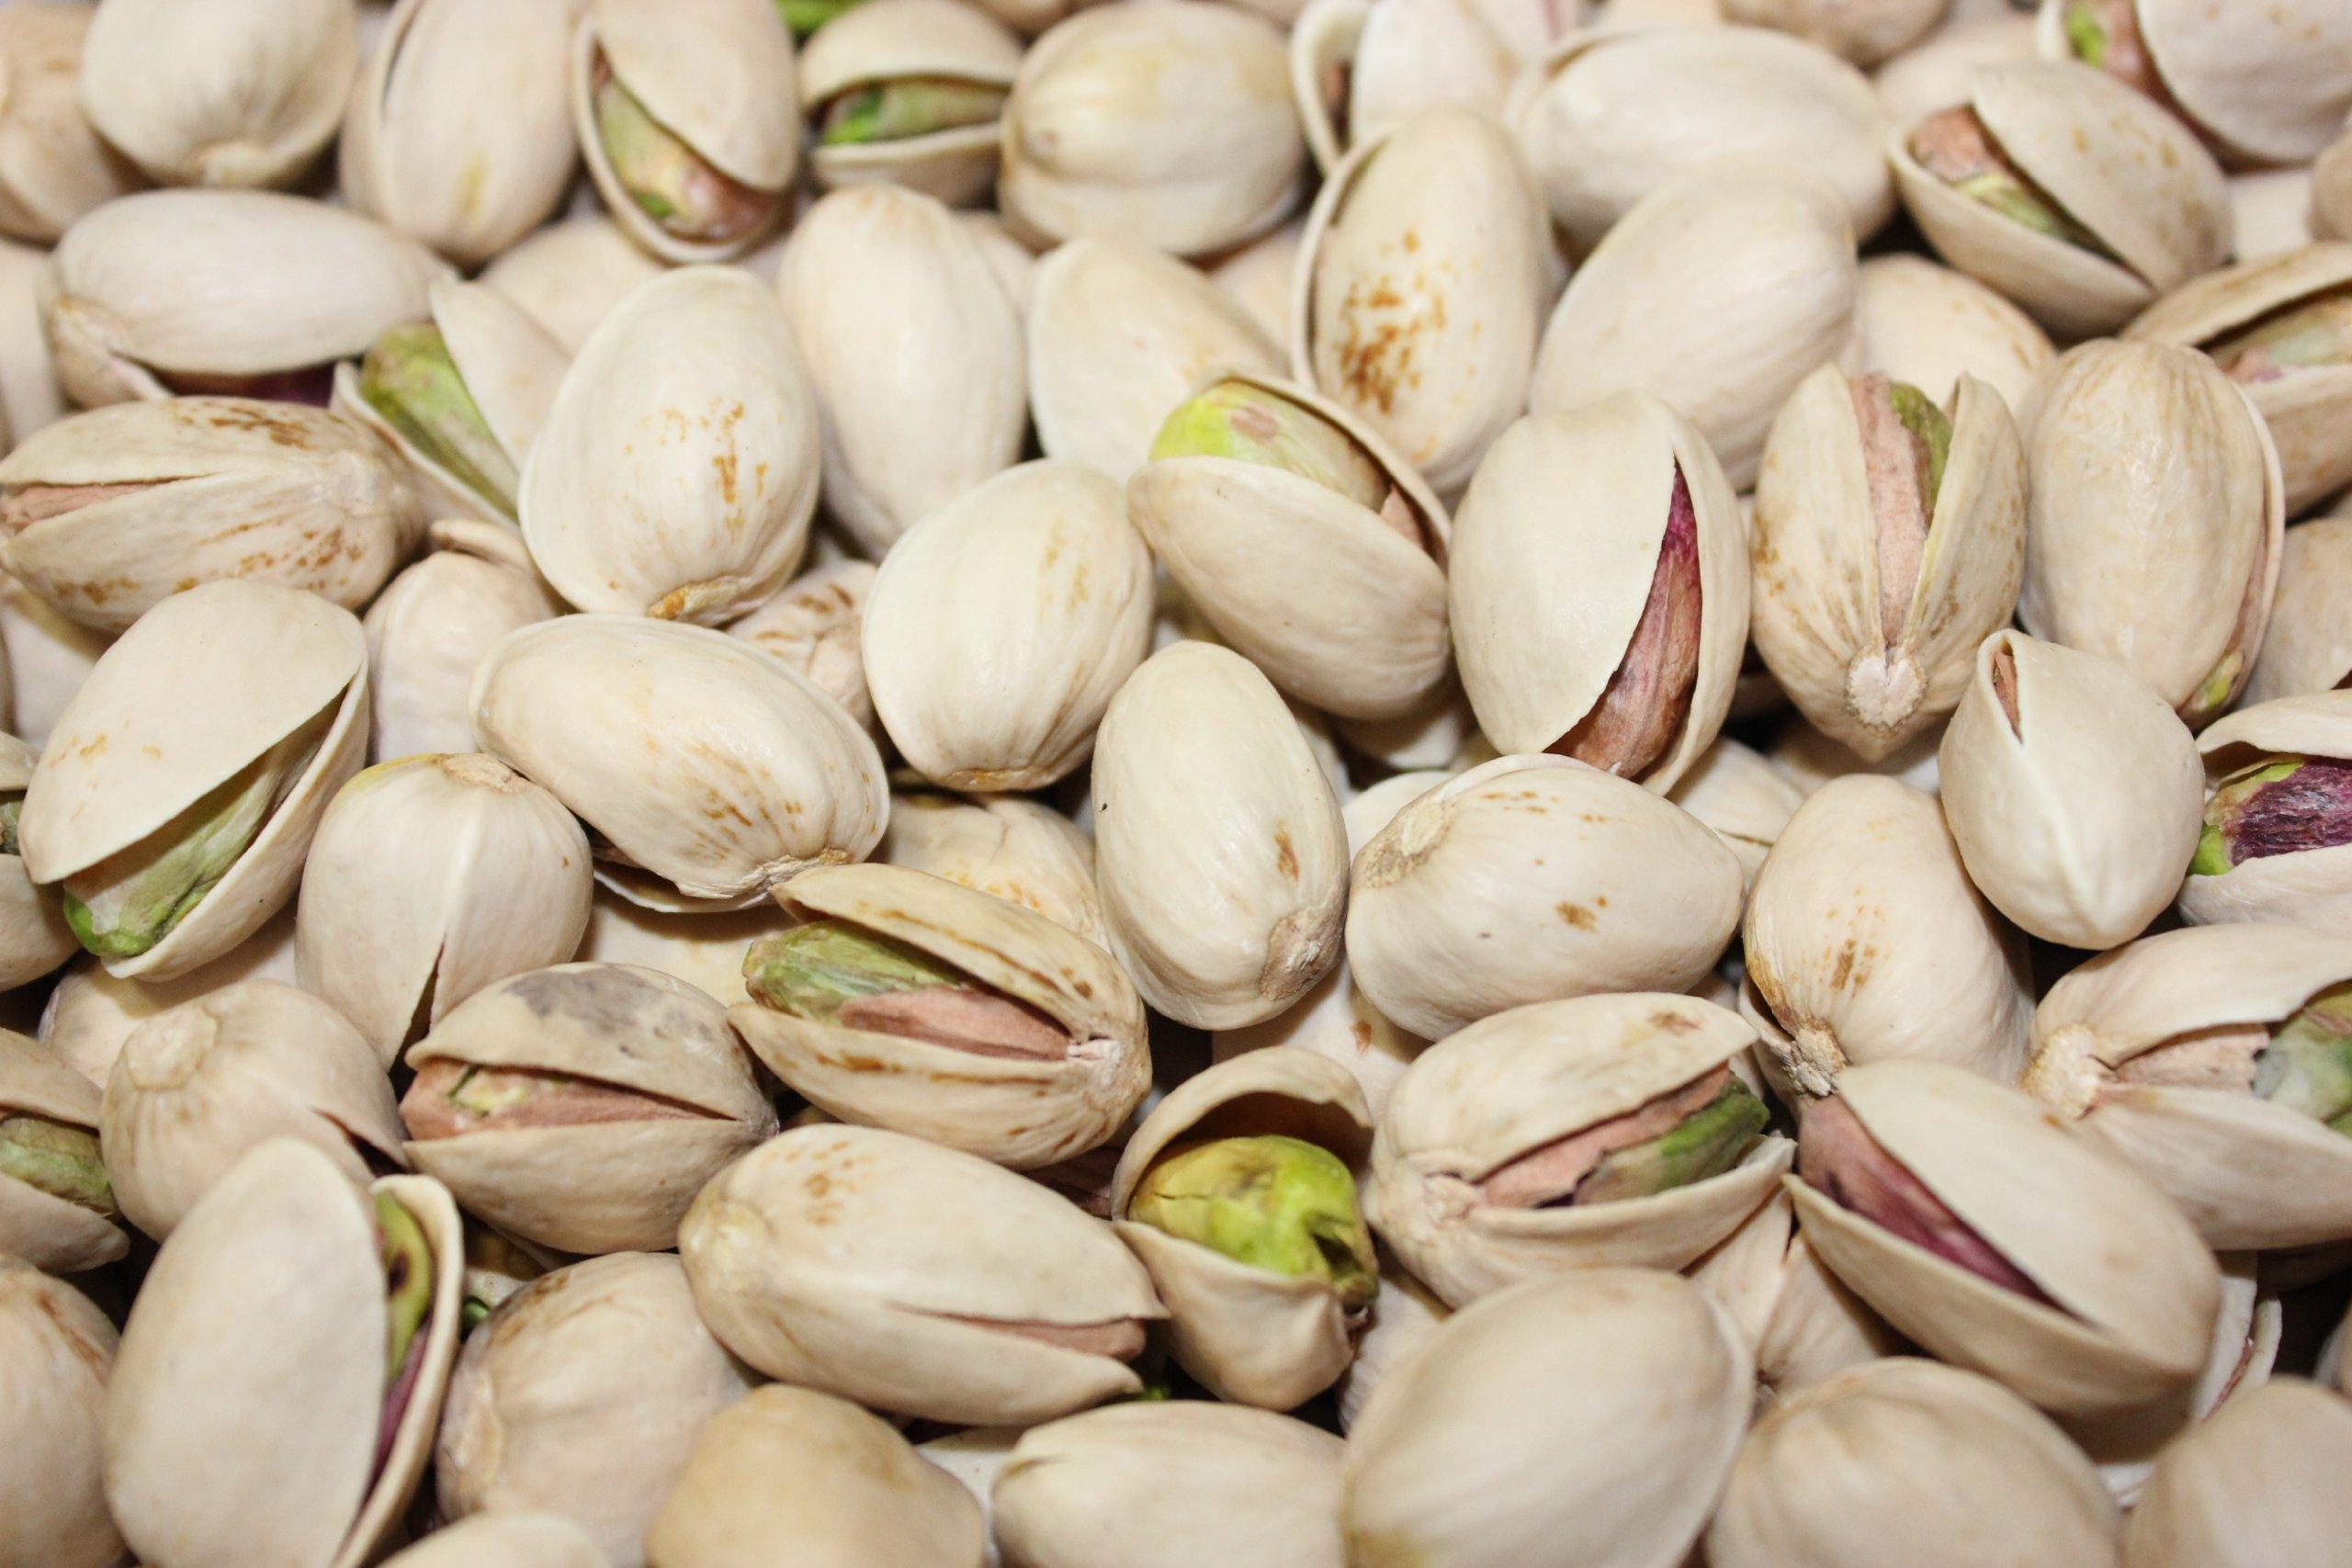 Braga Organic Farms 25 Lb Organic Raw Inshell Pistachios